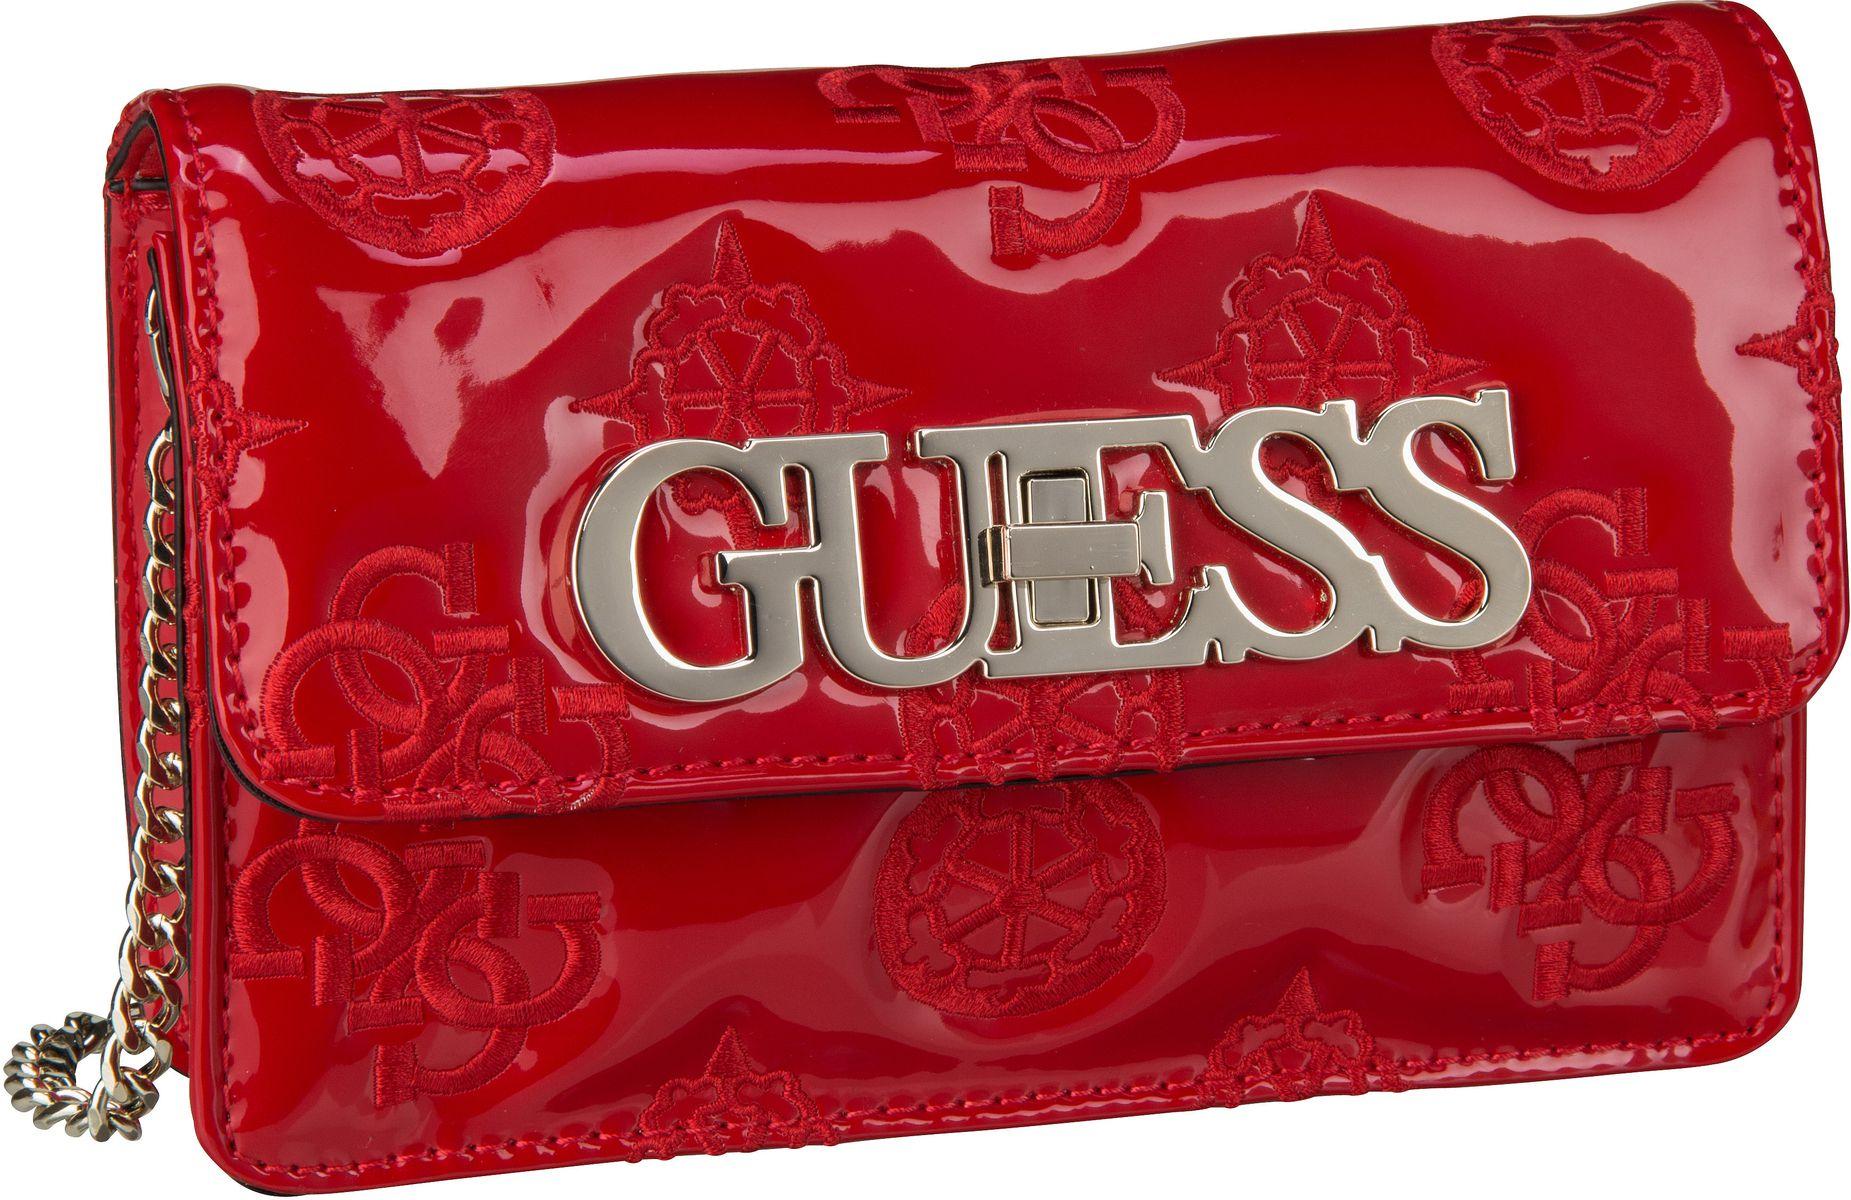 Clutches - Guess Abendtasche Clutch Guess Chic Mini Crossbody Flap Red  - Onlineshop Taschenkaufhaus